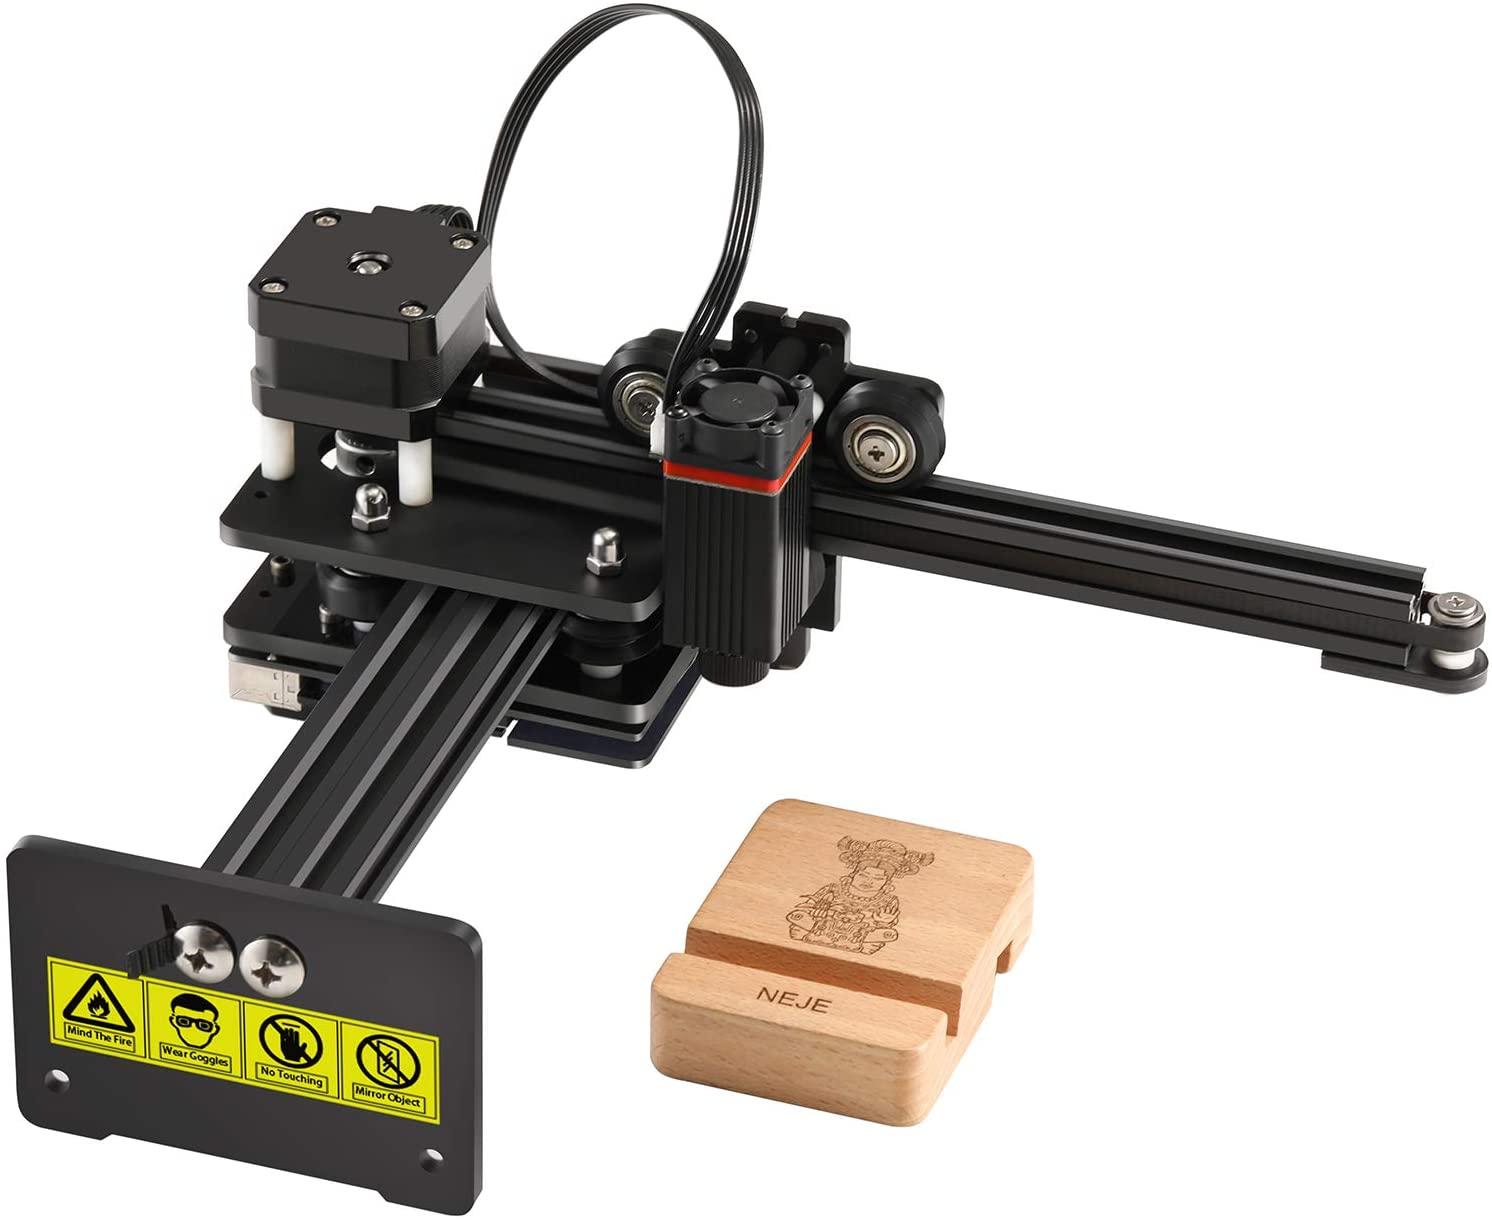 NEJE High-Speed Engraving Machine